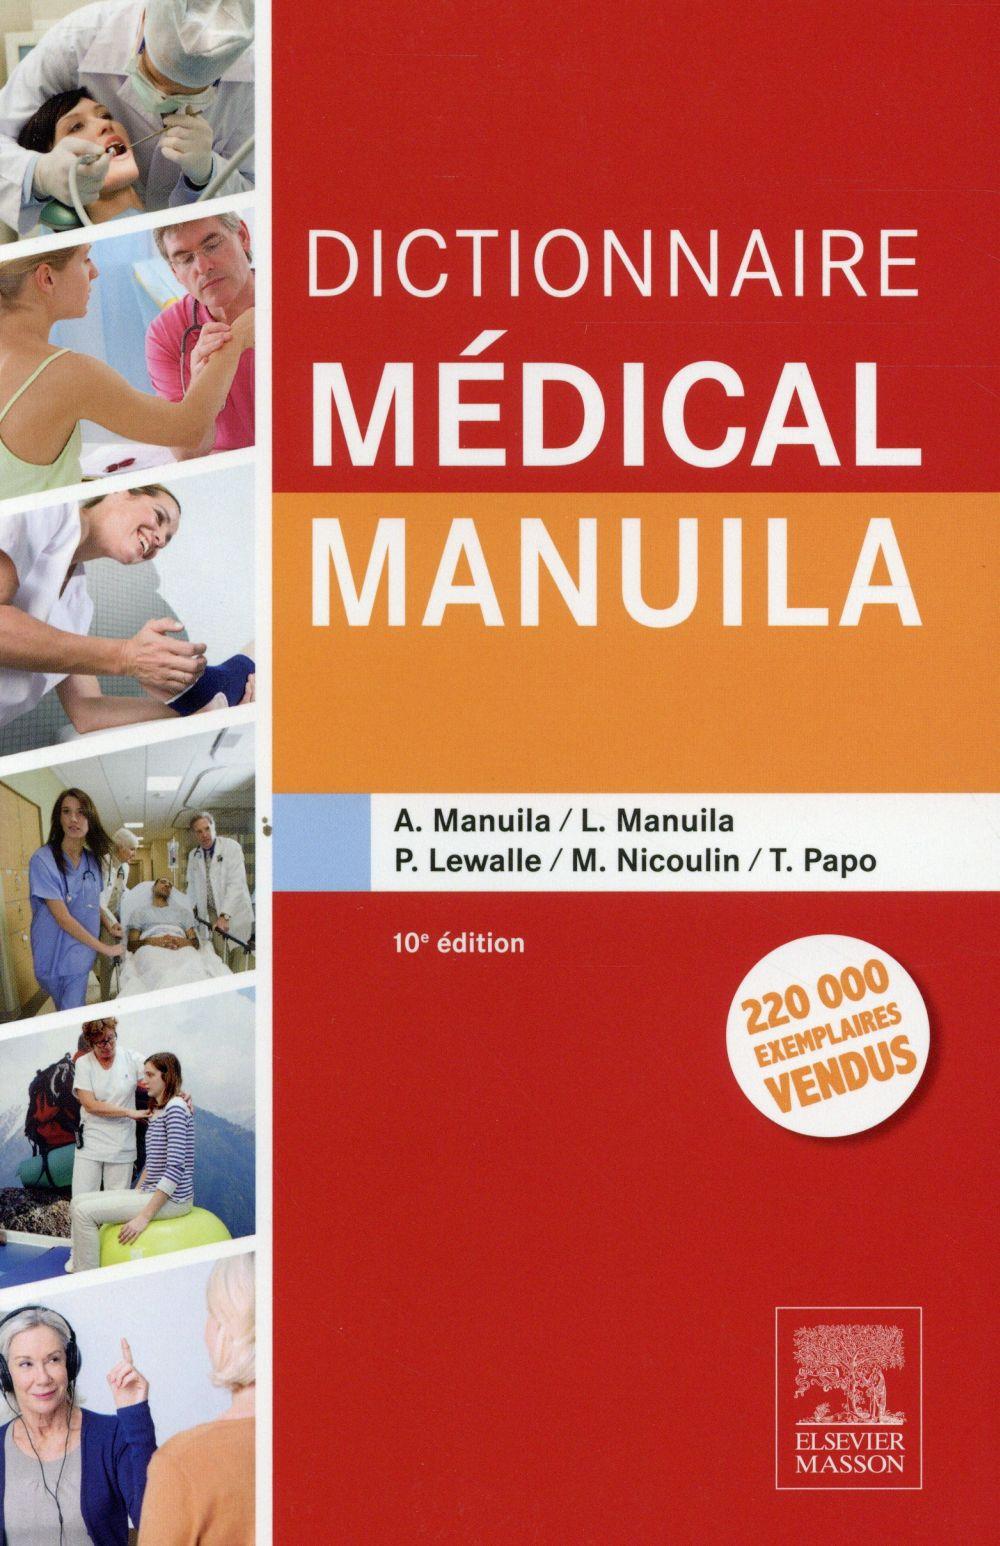 DICTIONNAIRE MEDICAL MANUILA MANUILA, ALEXANDRE Elsevier Masson